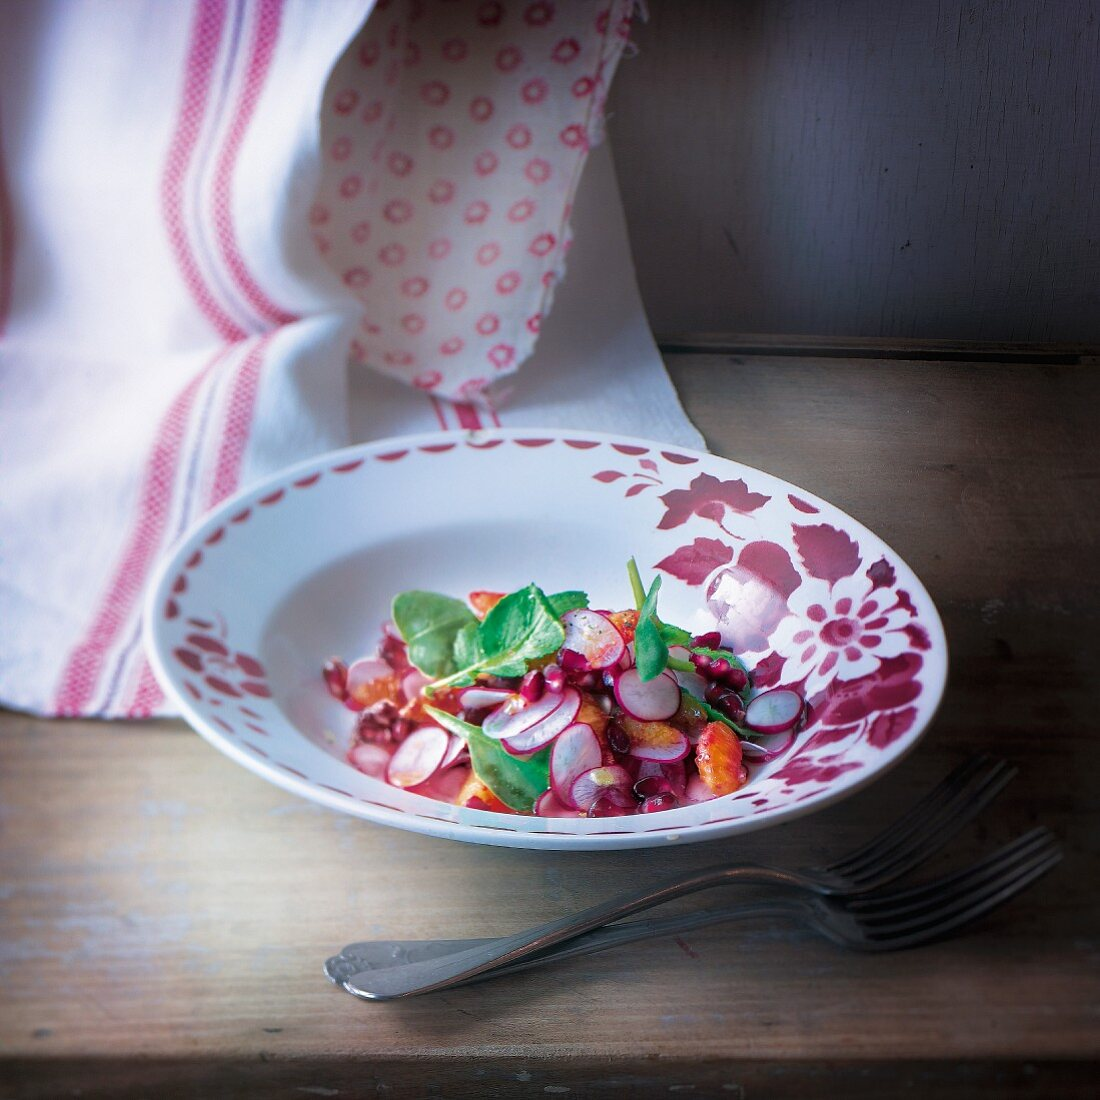 Radish and pomegranate salad